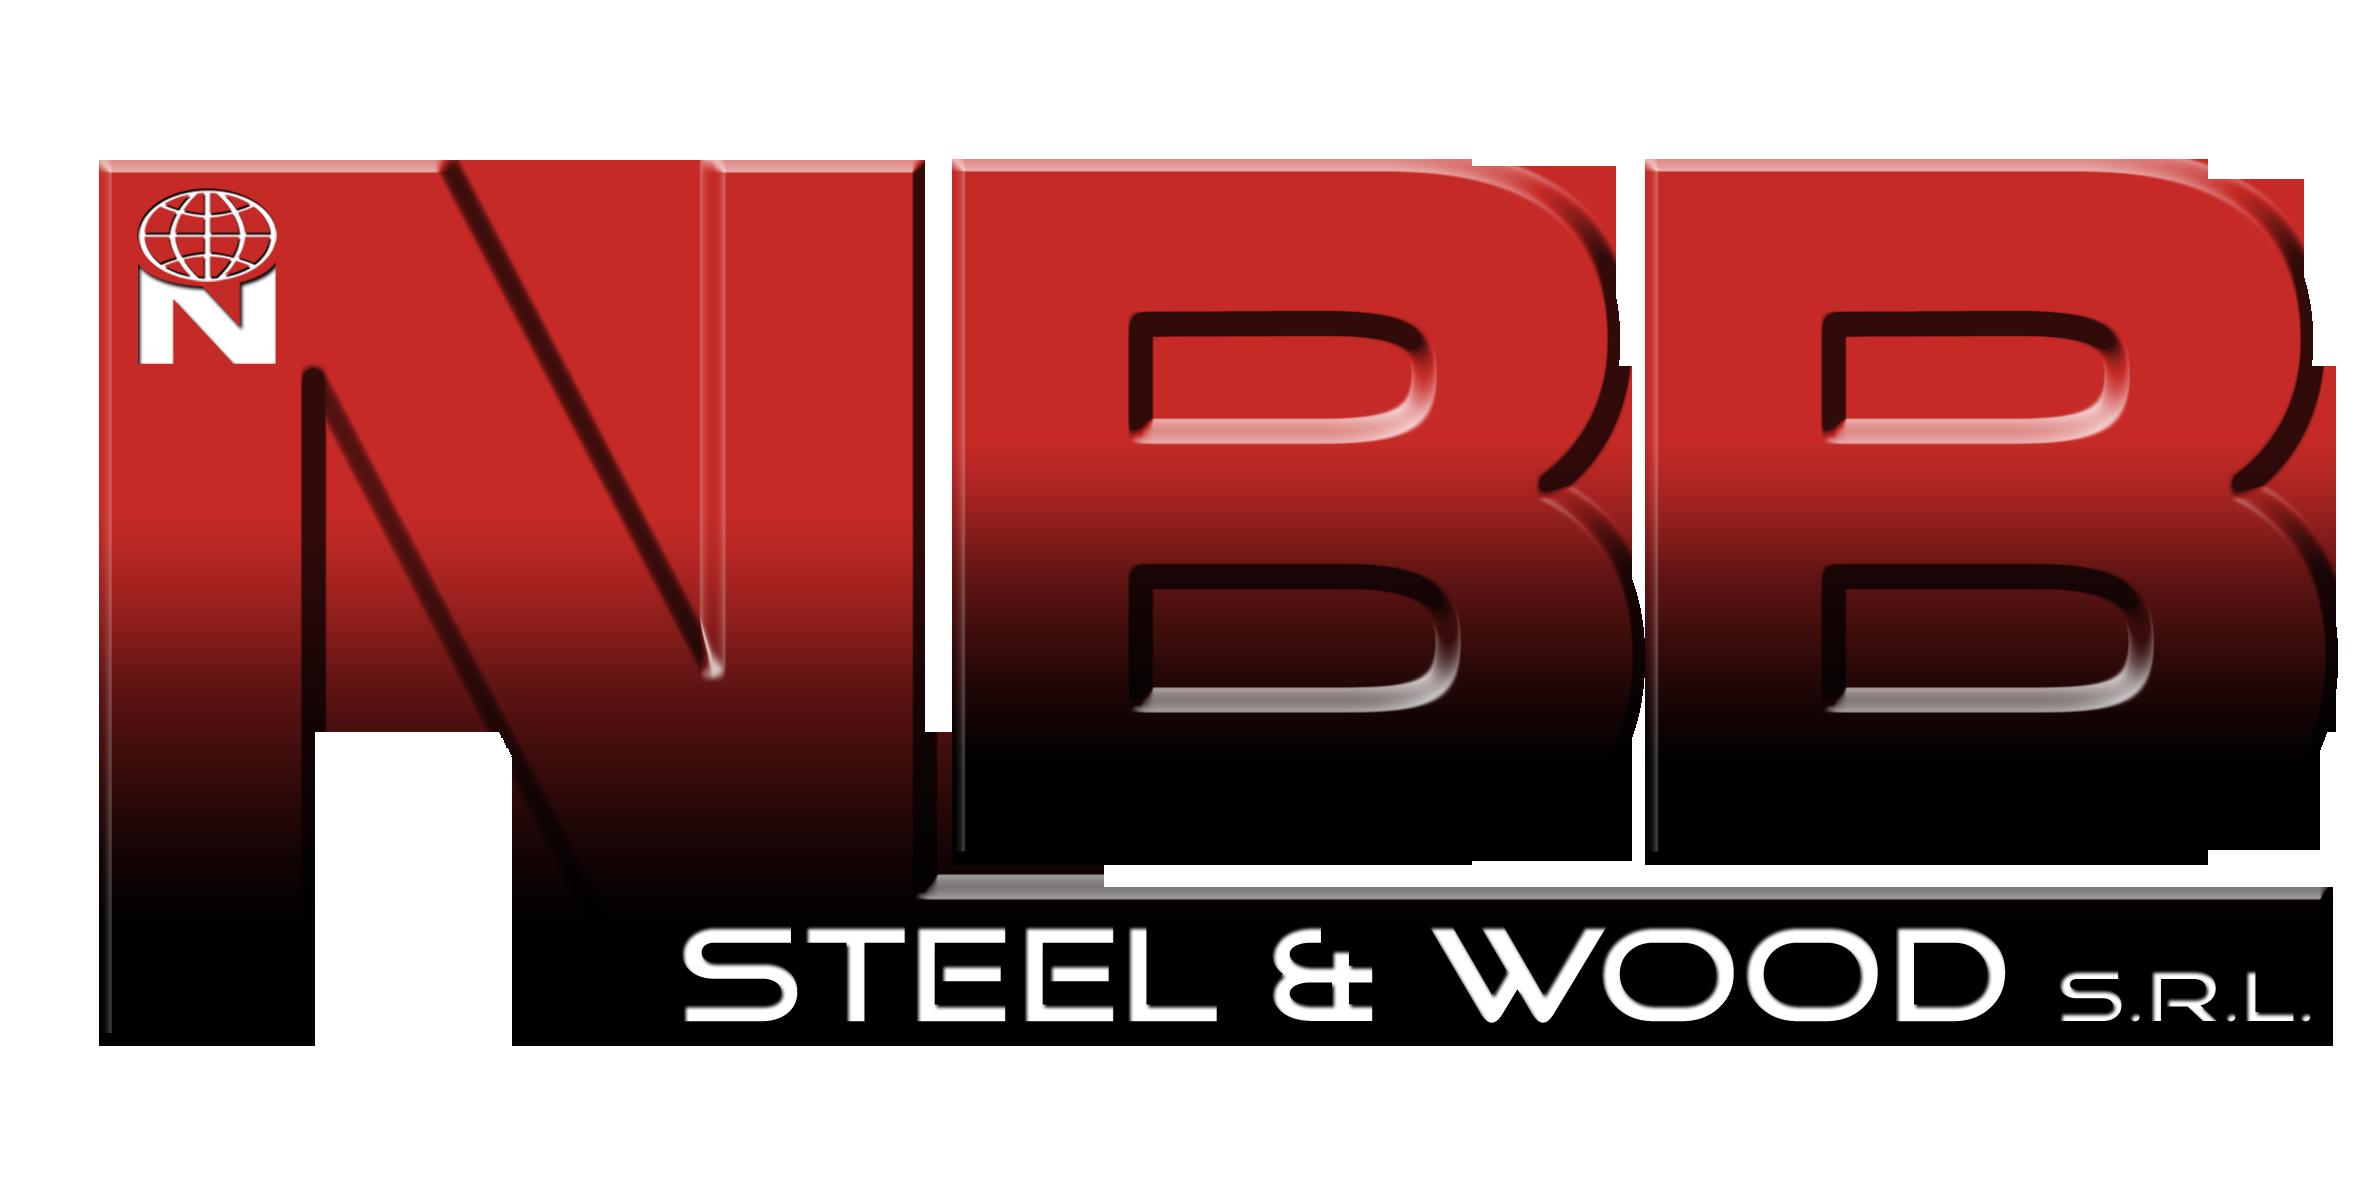 NBB Steel and Wood SRL